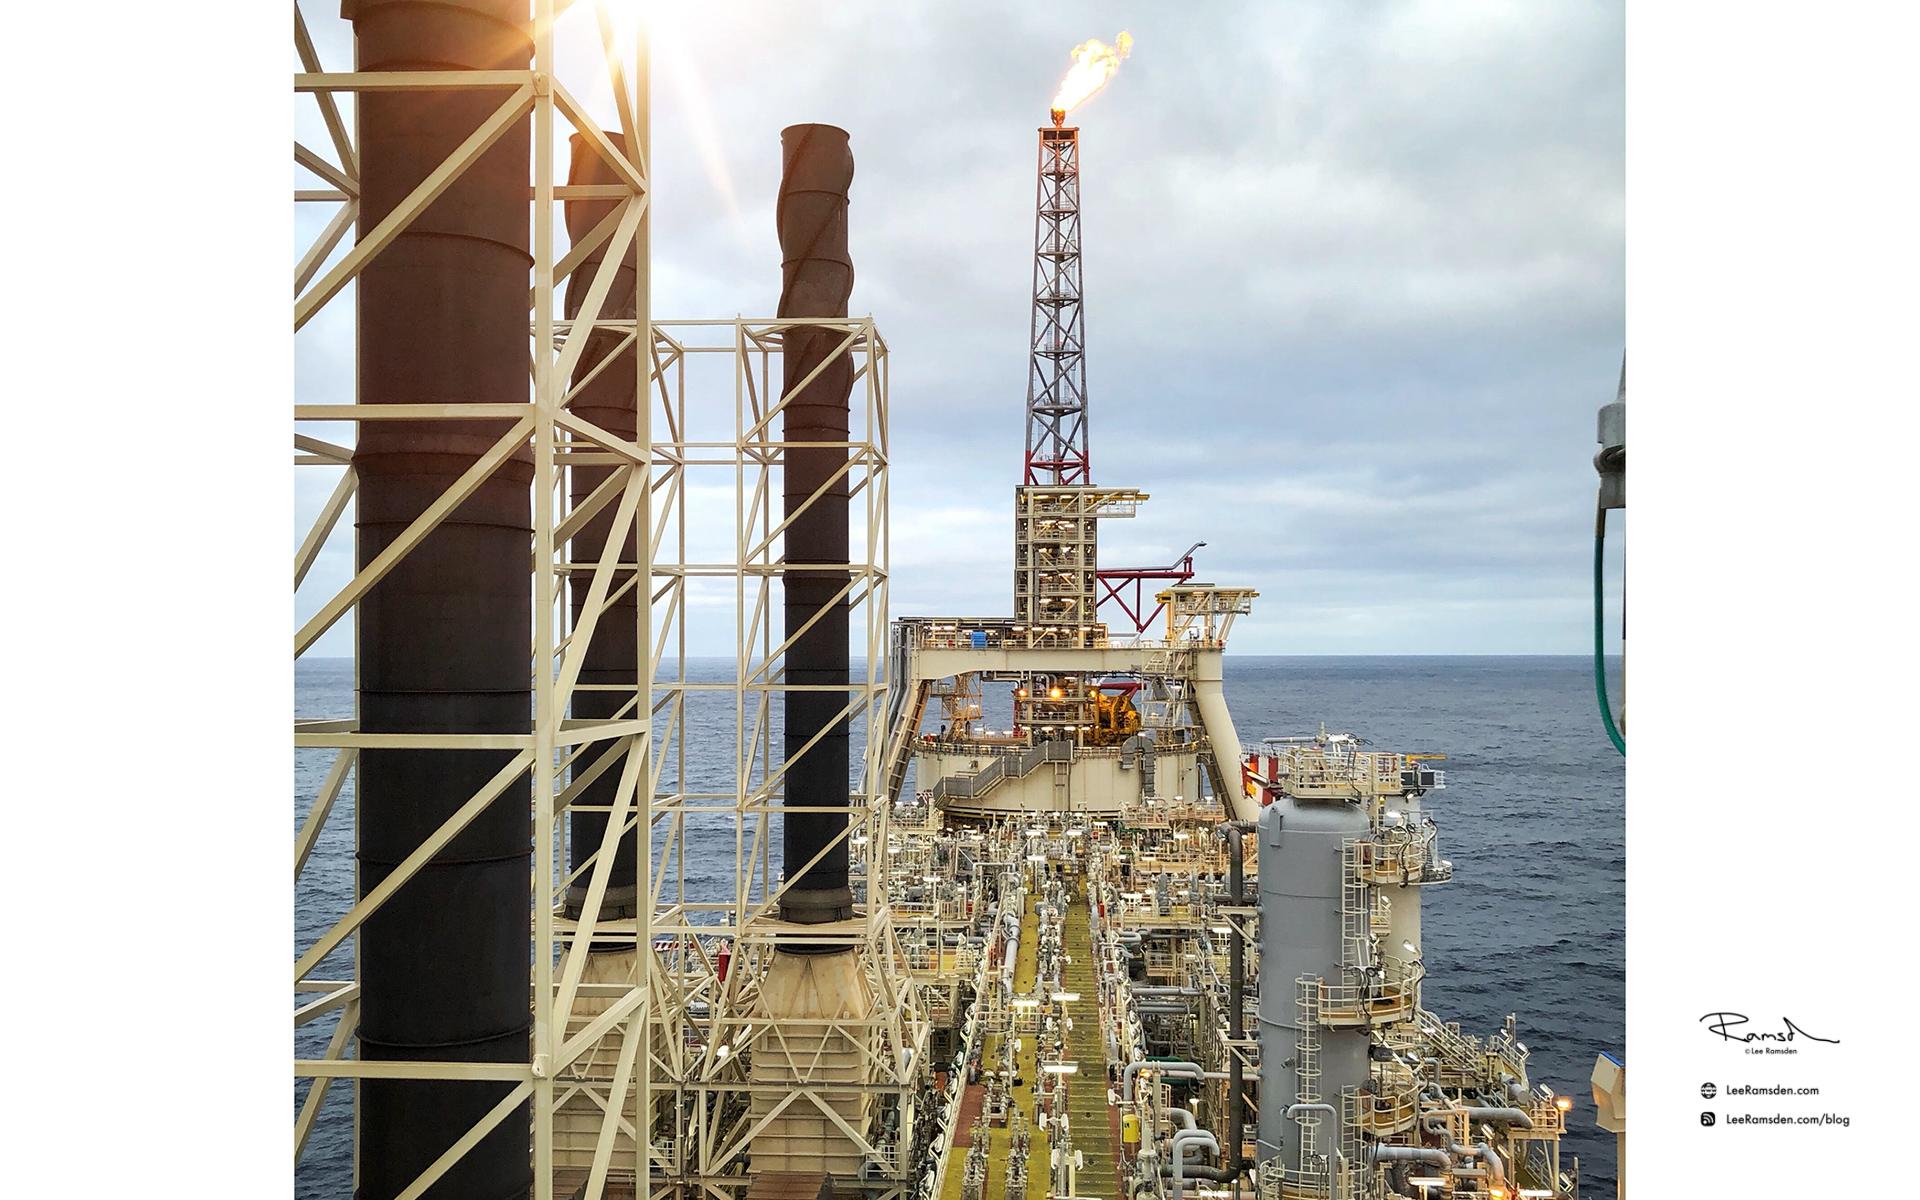 BP Glen Lyon, north sea oil and gas industry, lee ramsden